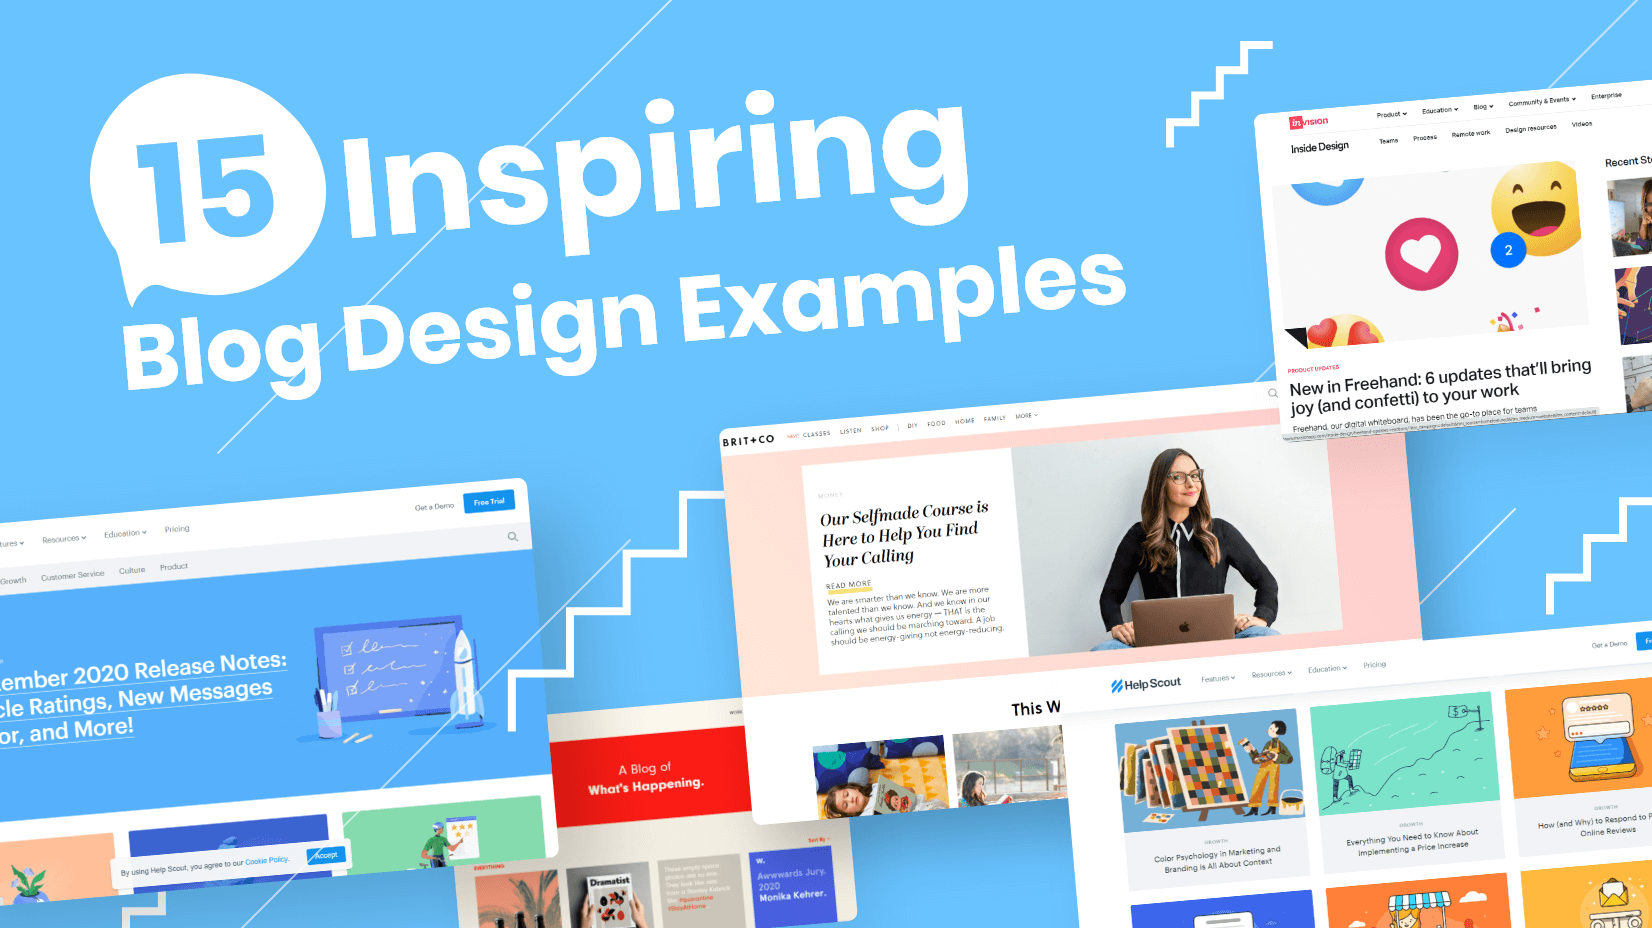 15 Inspiring Blog Design Examples